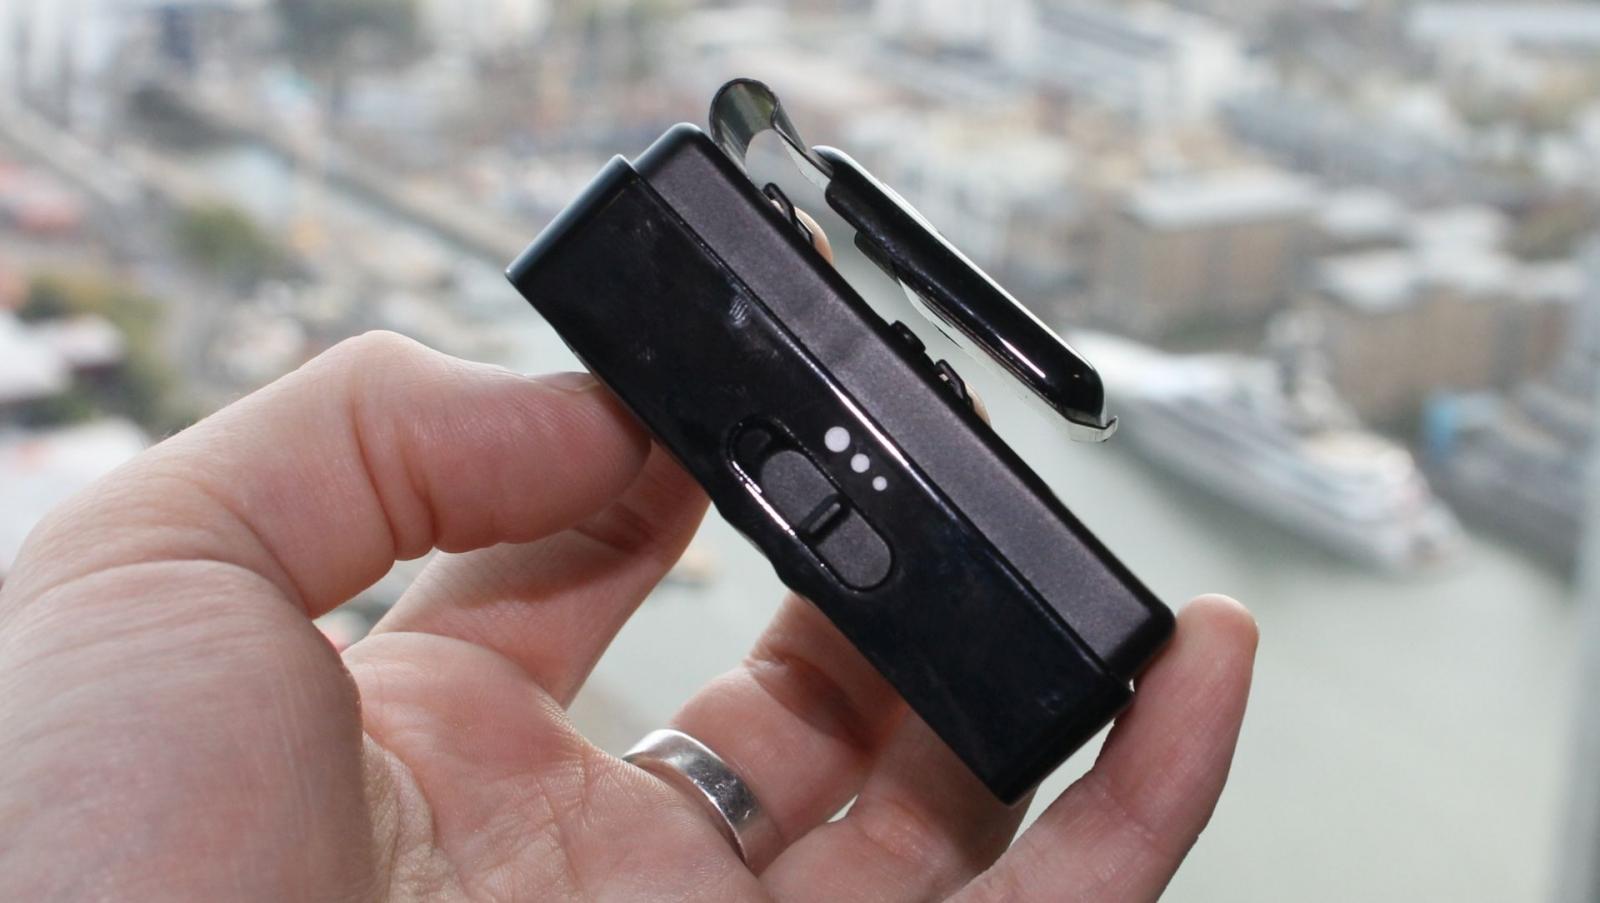 Woojer belt clip side view